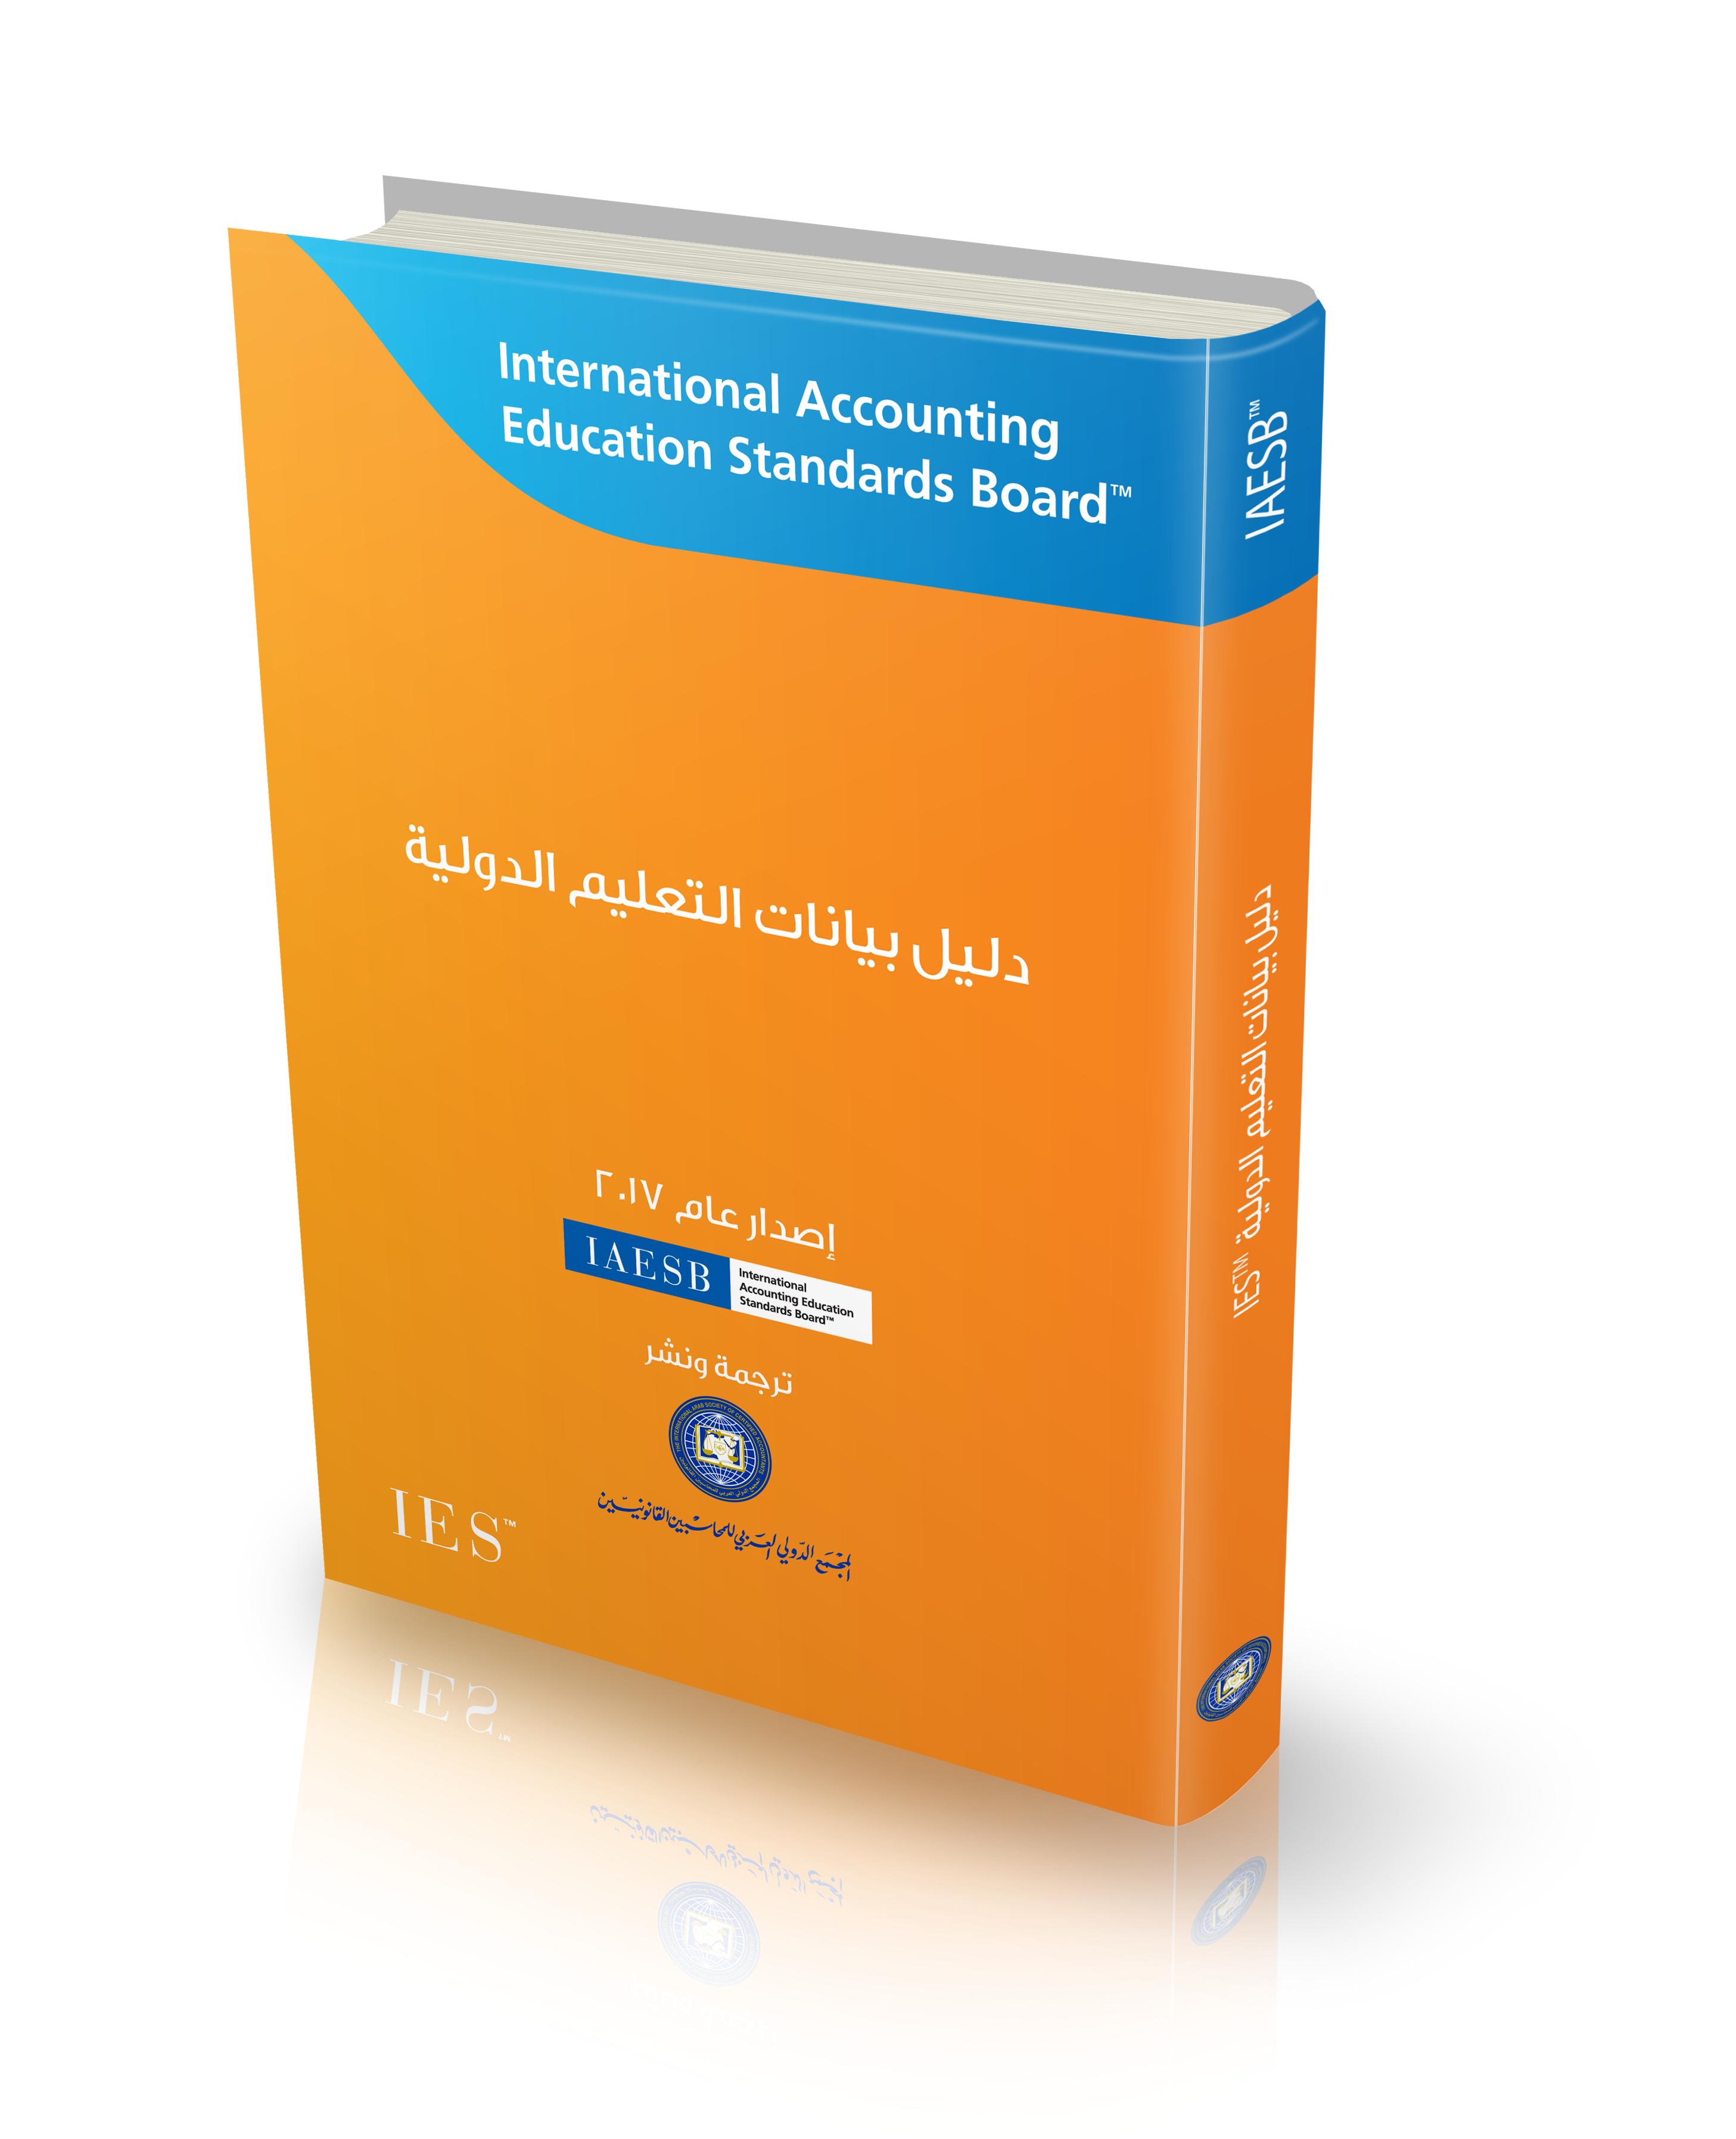 The International Arab Society of Certified Accountants